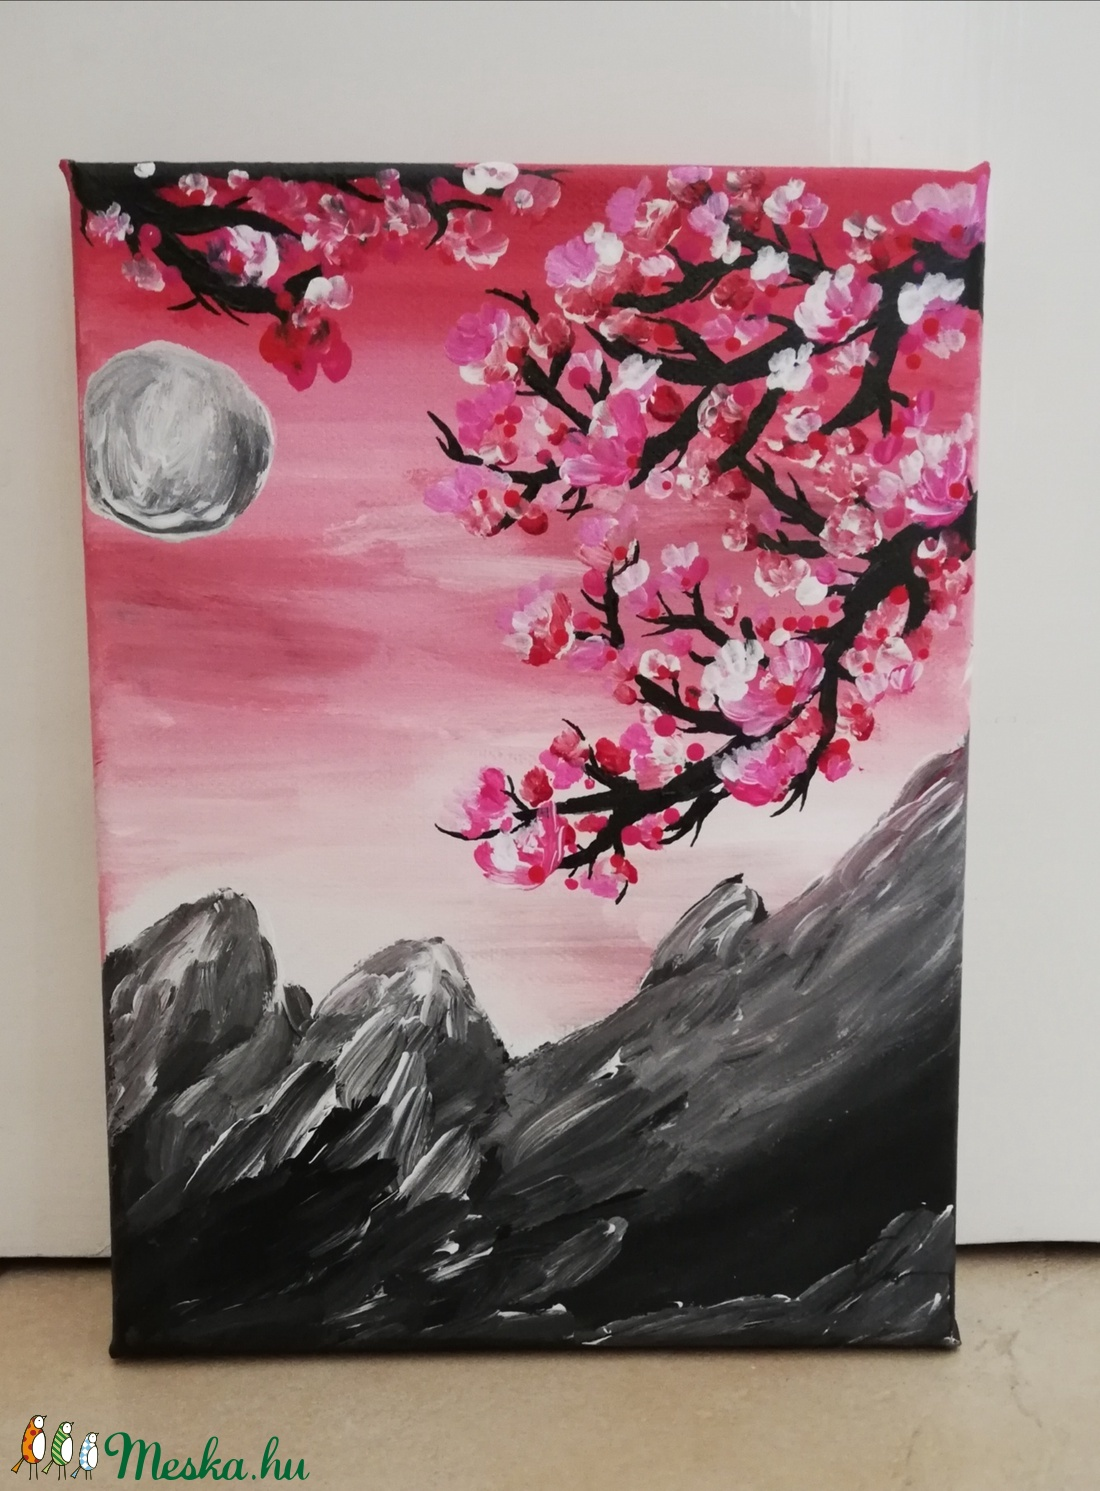 Blossom (Glacise) - Meska.hu